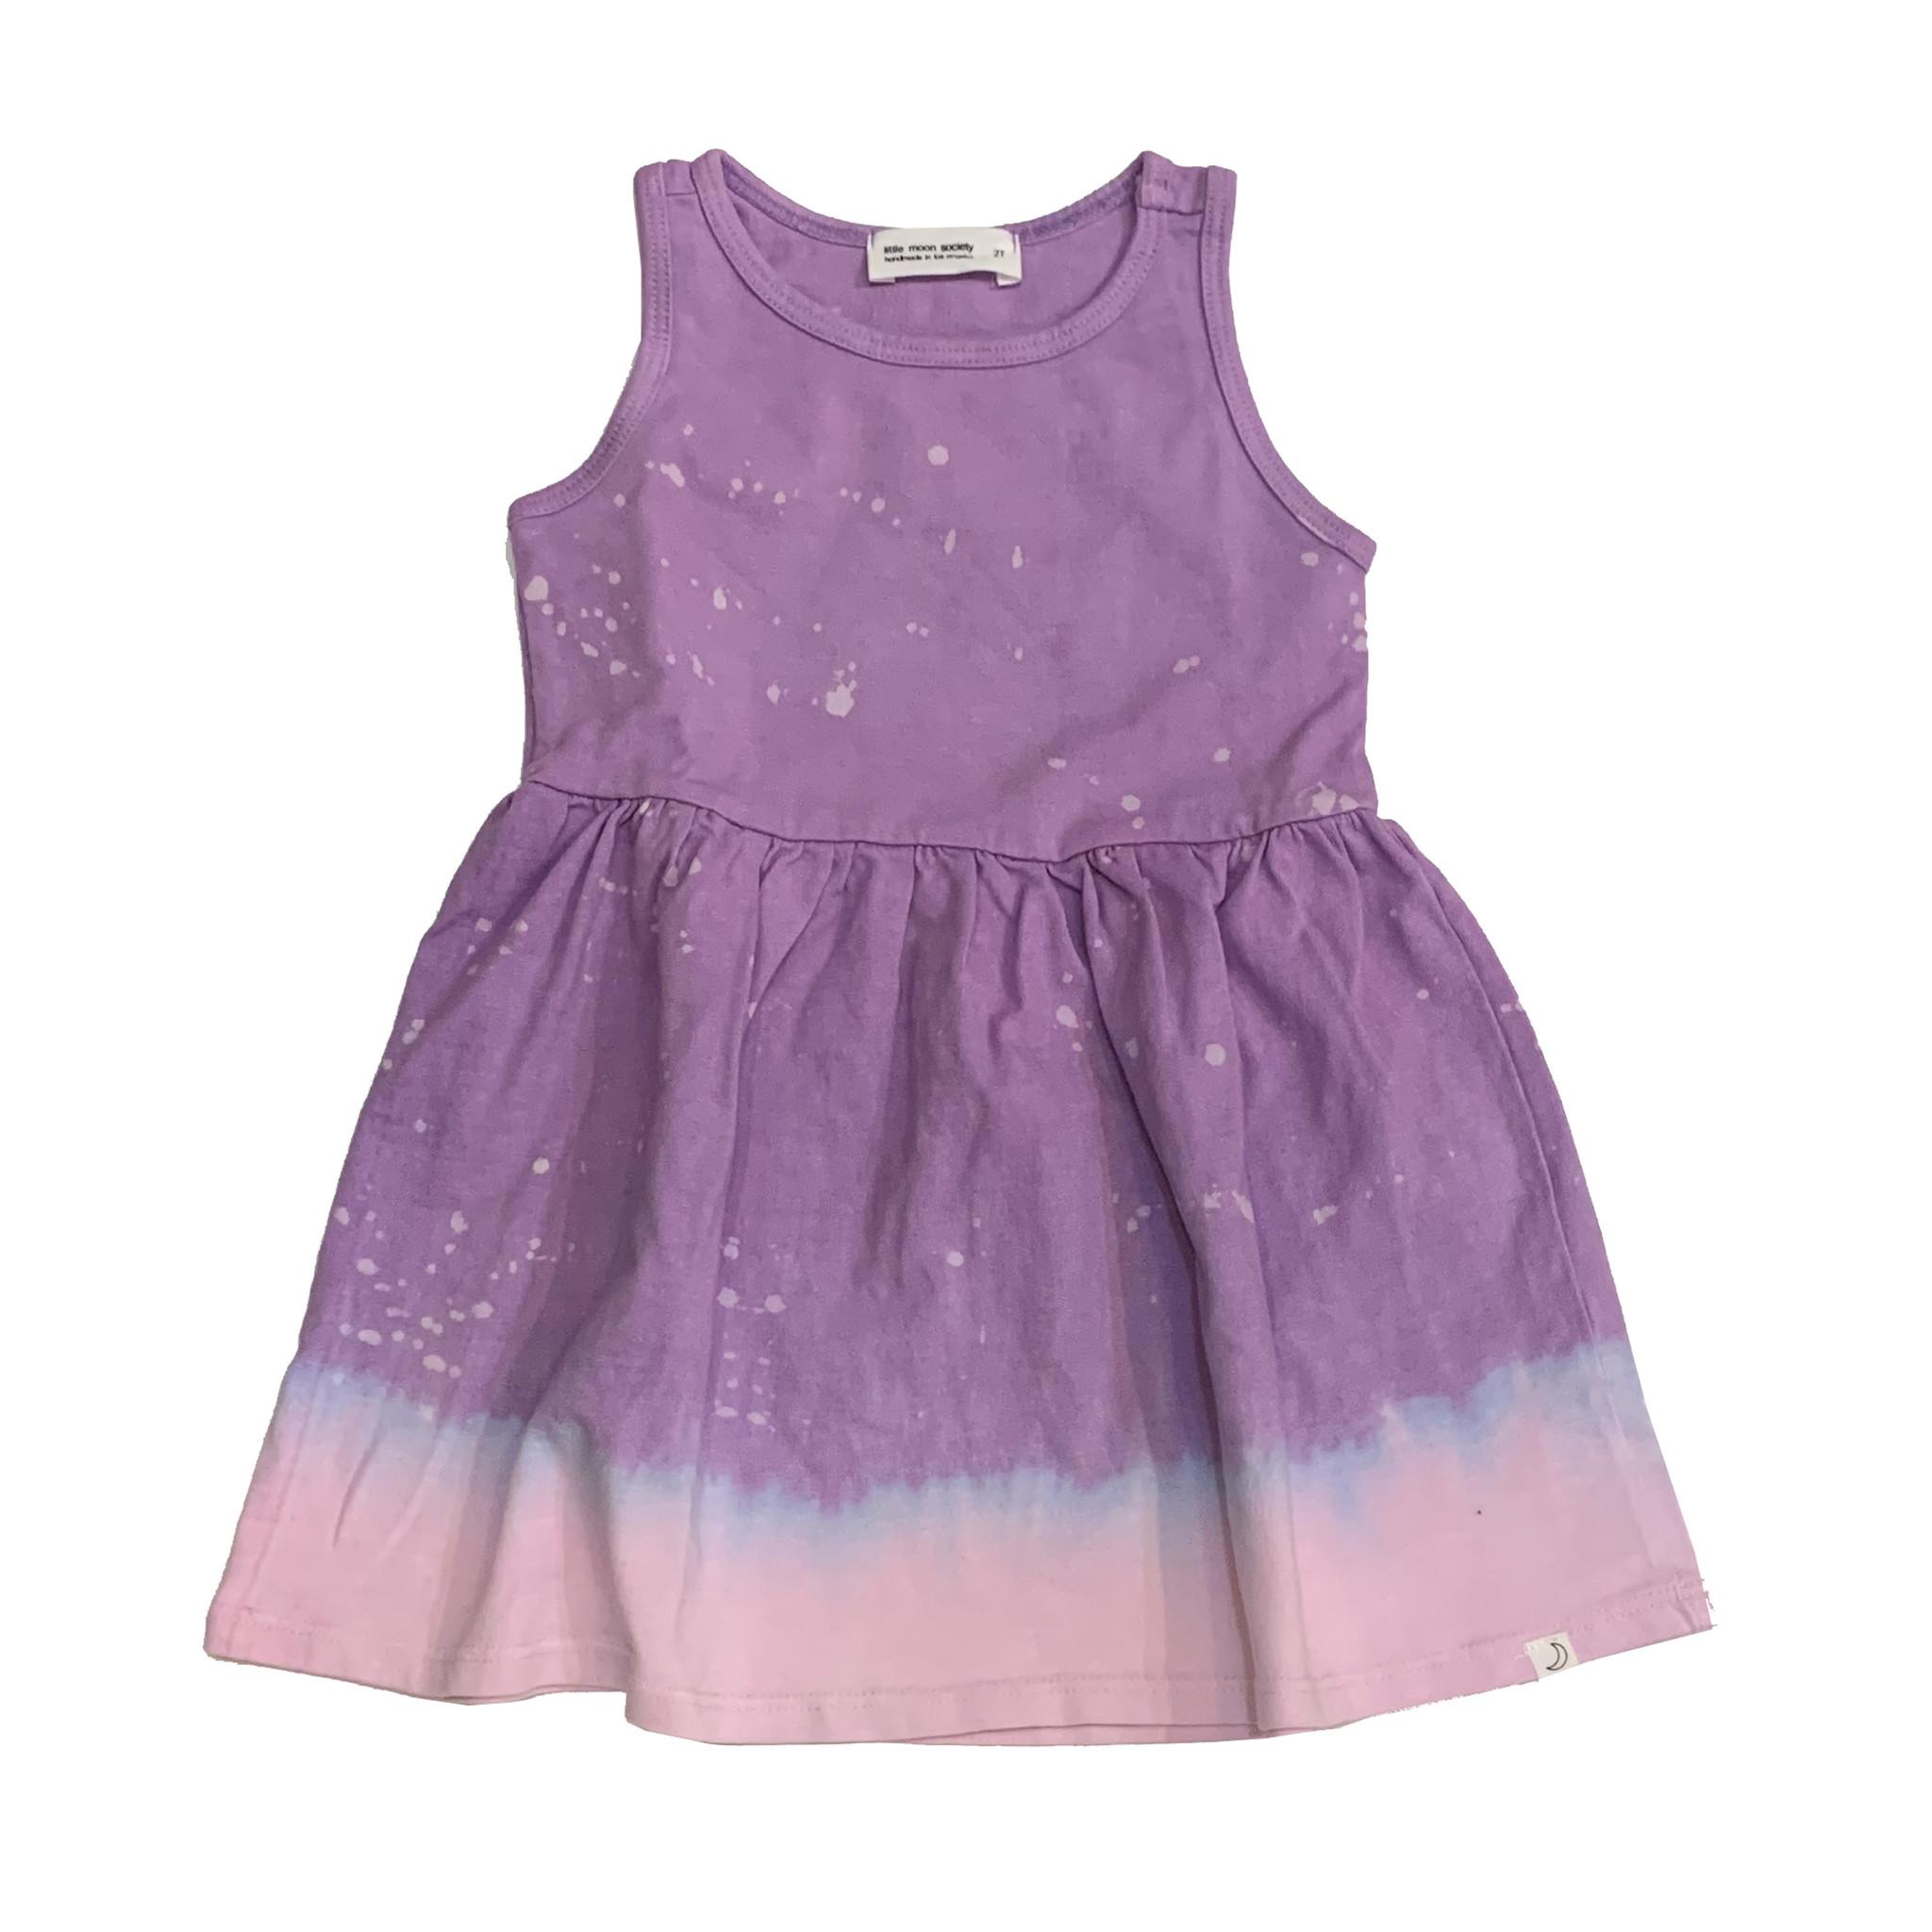 Little Moon Society Lilac Splatter Dress